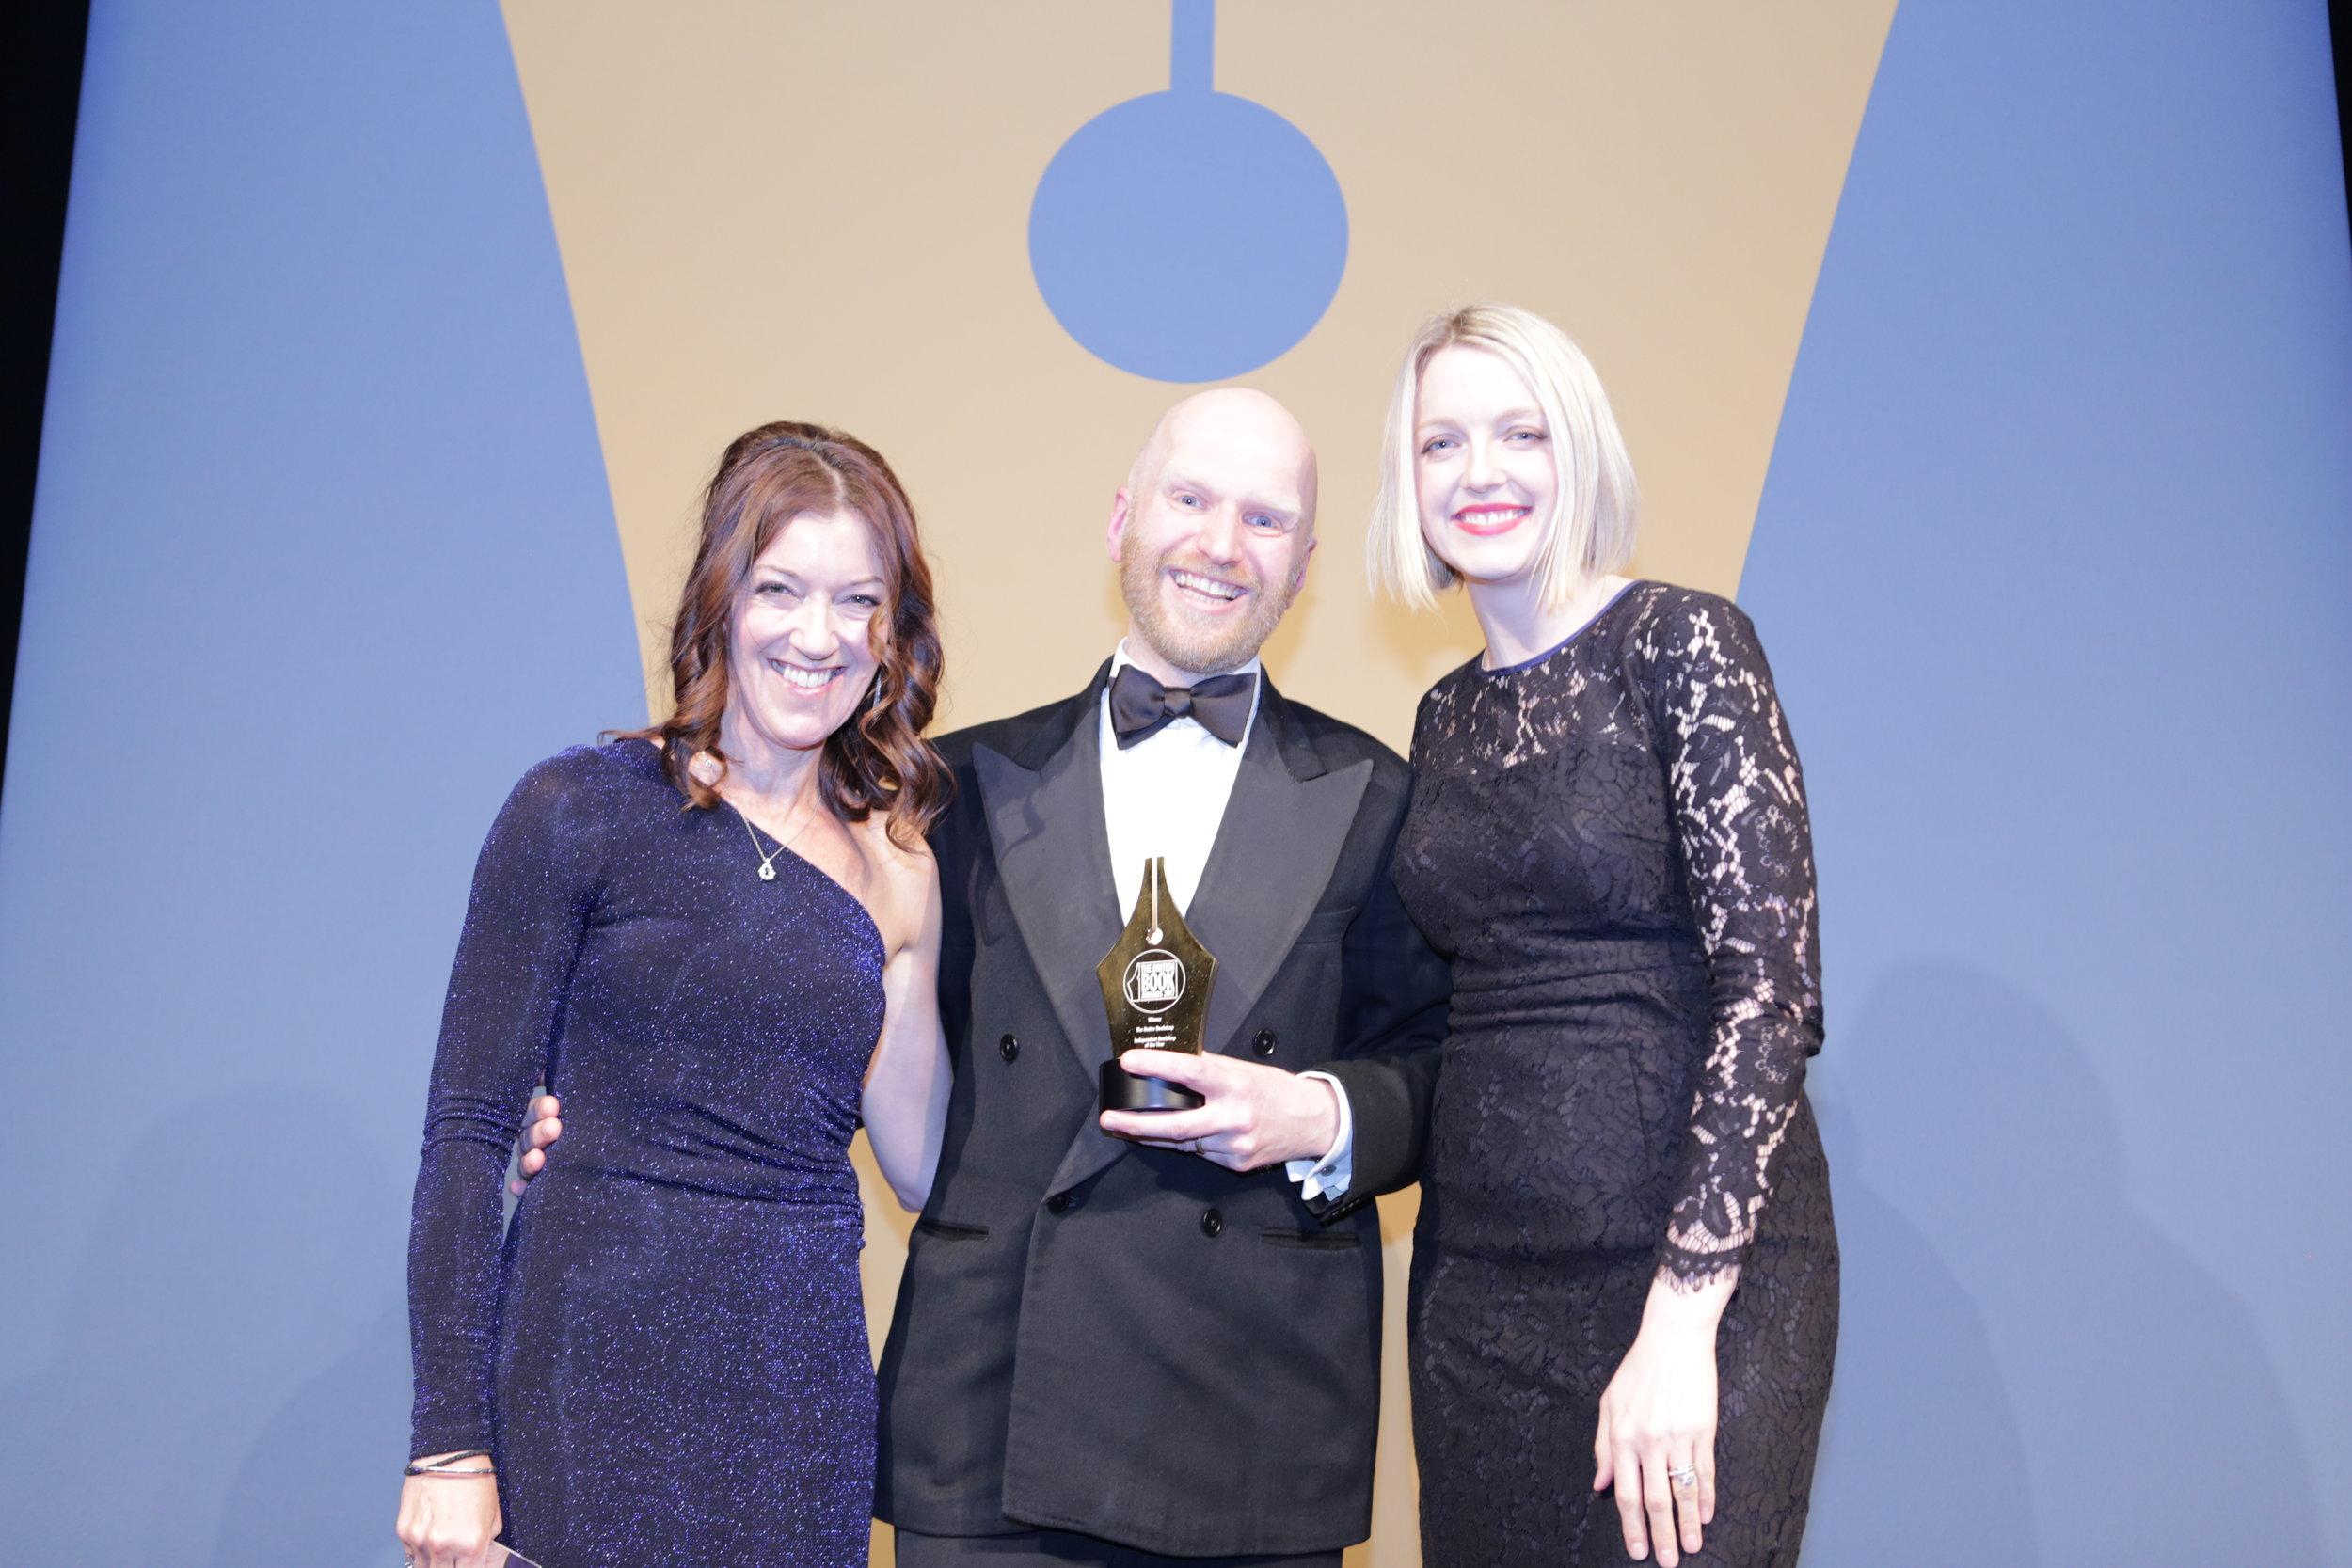 Shop owner Bob Johnston with Victoria Hislop (left) and ceremony host Lauren Laverne (right)